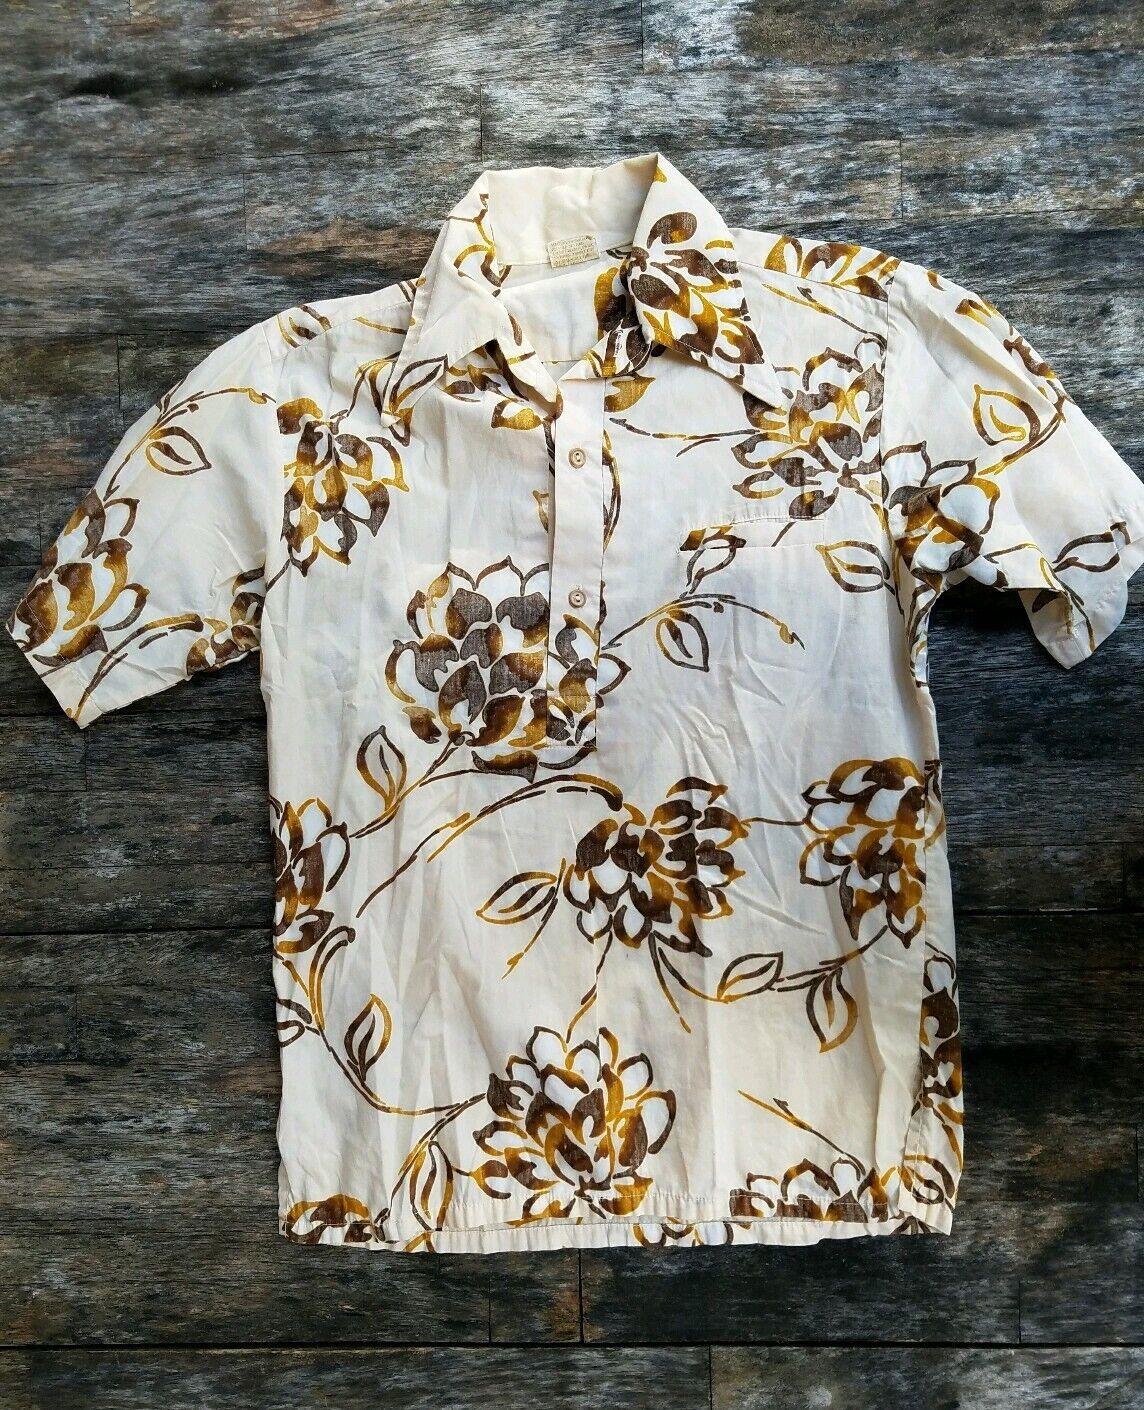 Go Barefoot medium [M] 100% cotton 1960's 70's Aloha Hawaiian shirt made in USA